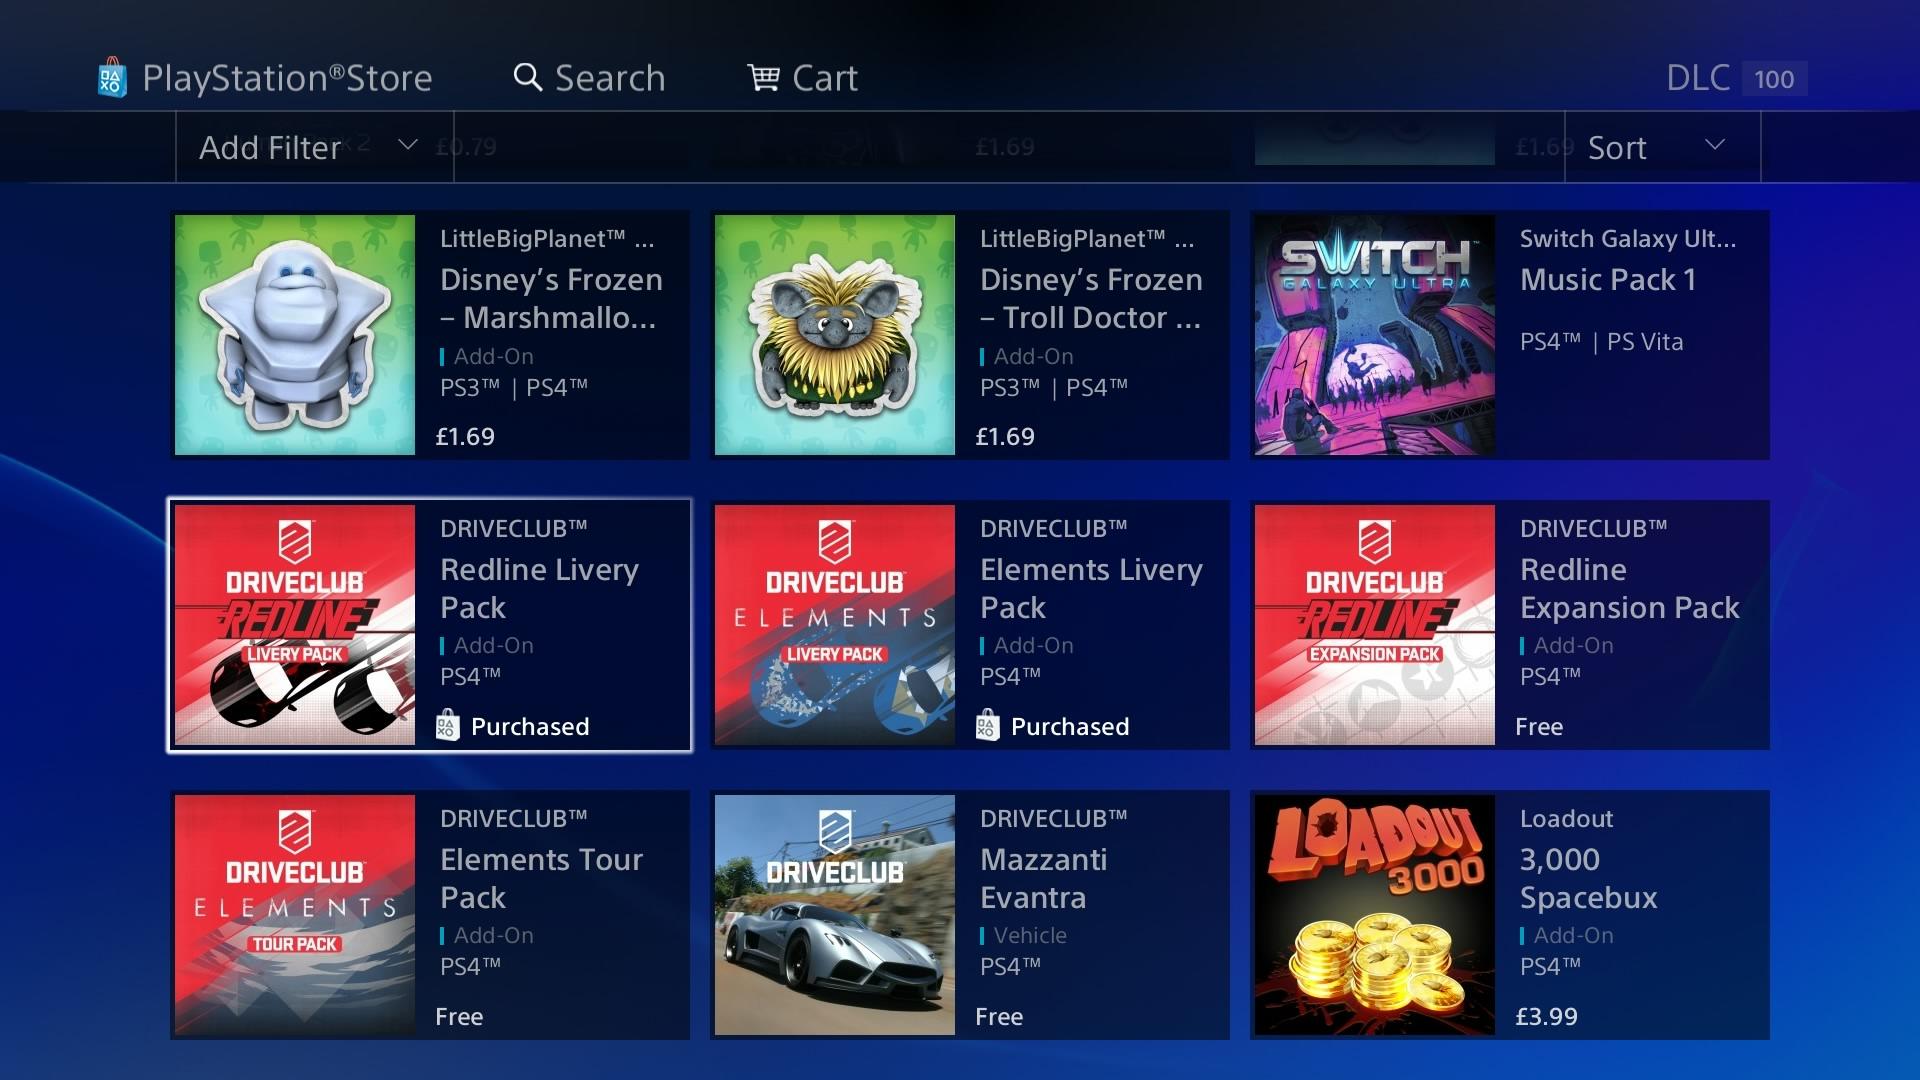 Driveclub PSN Store asset creation